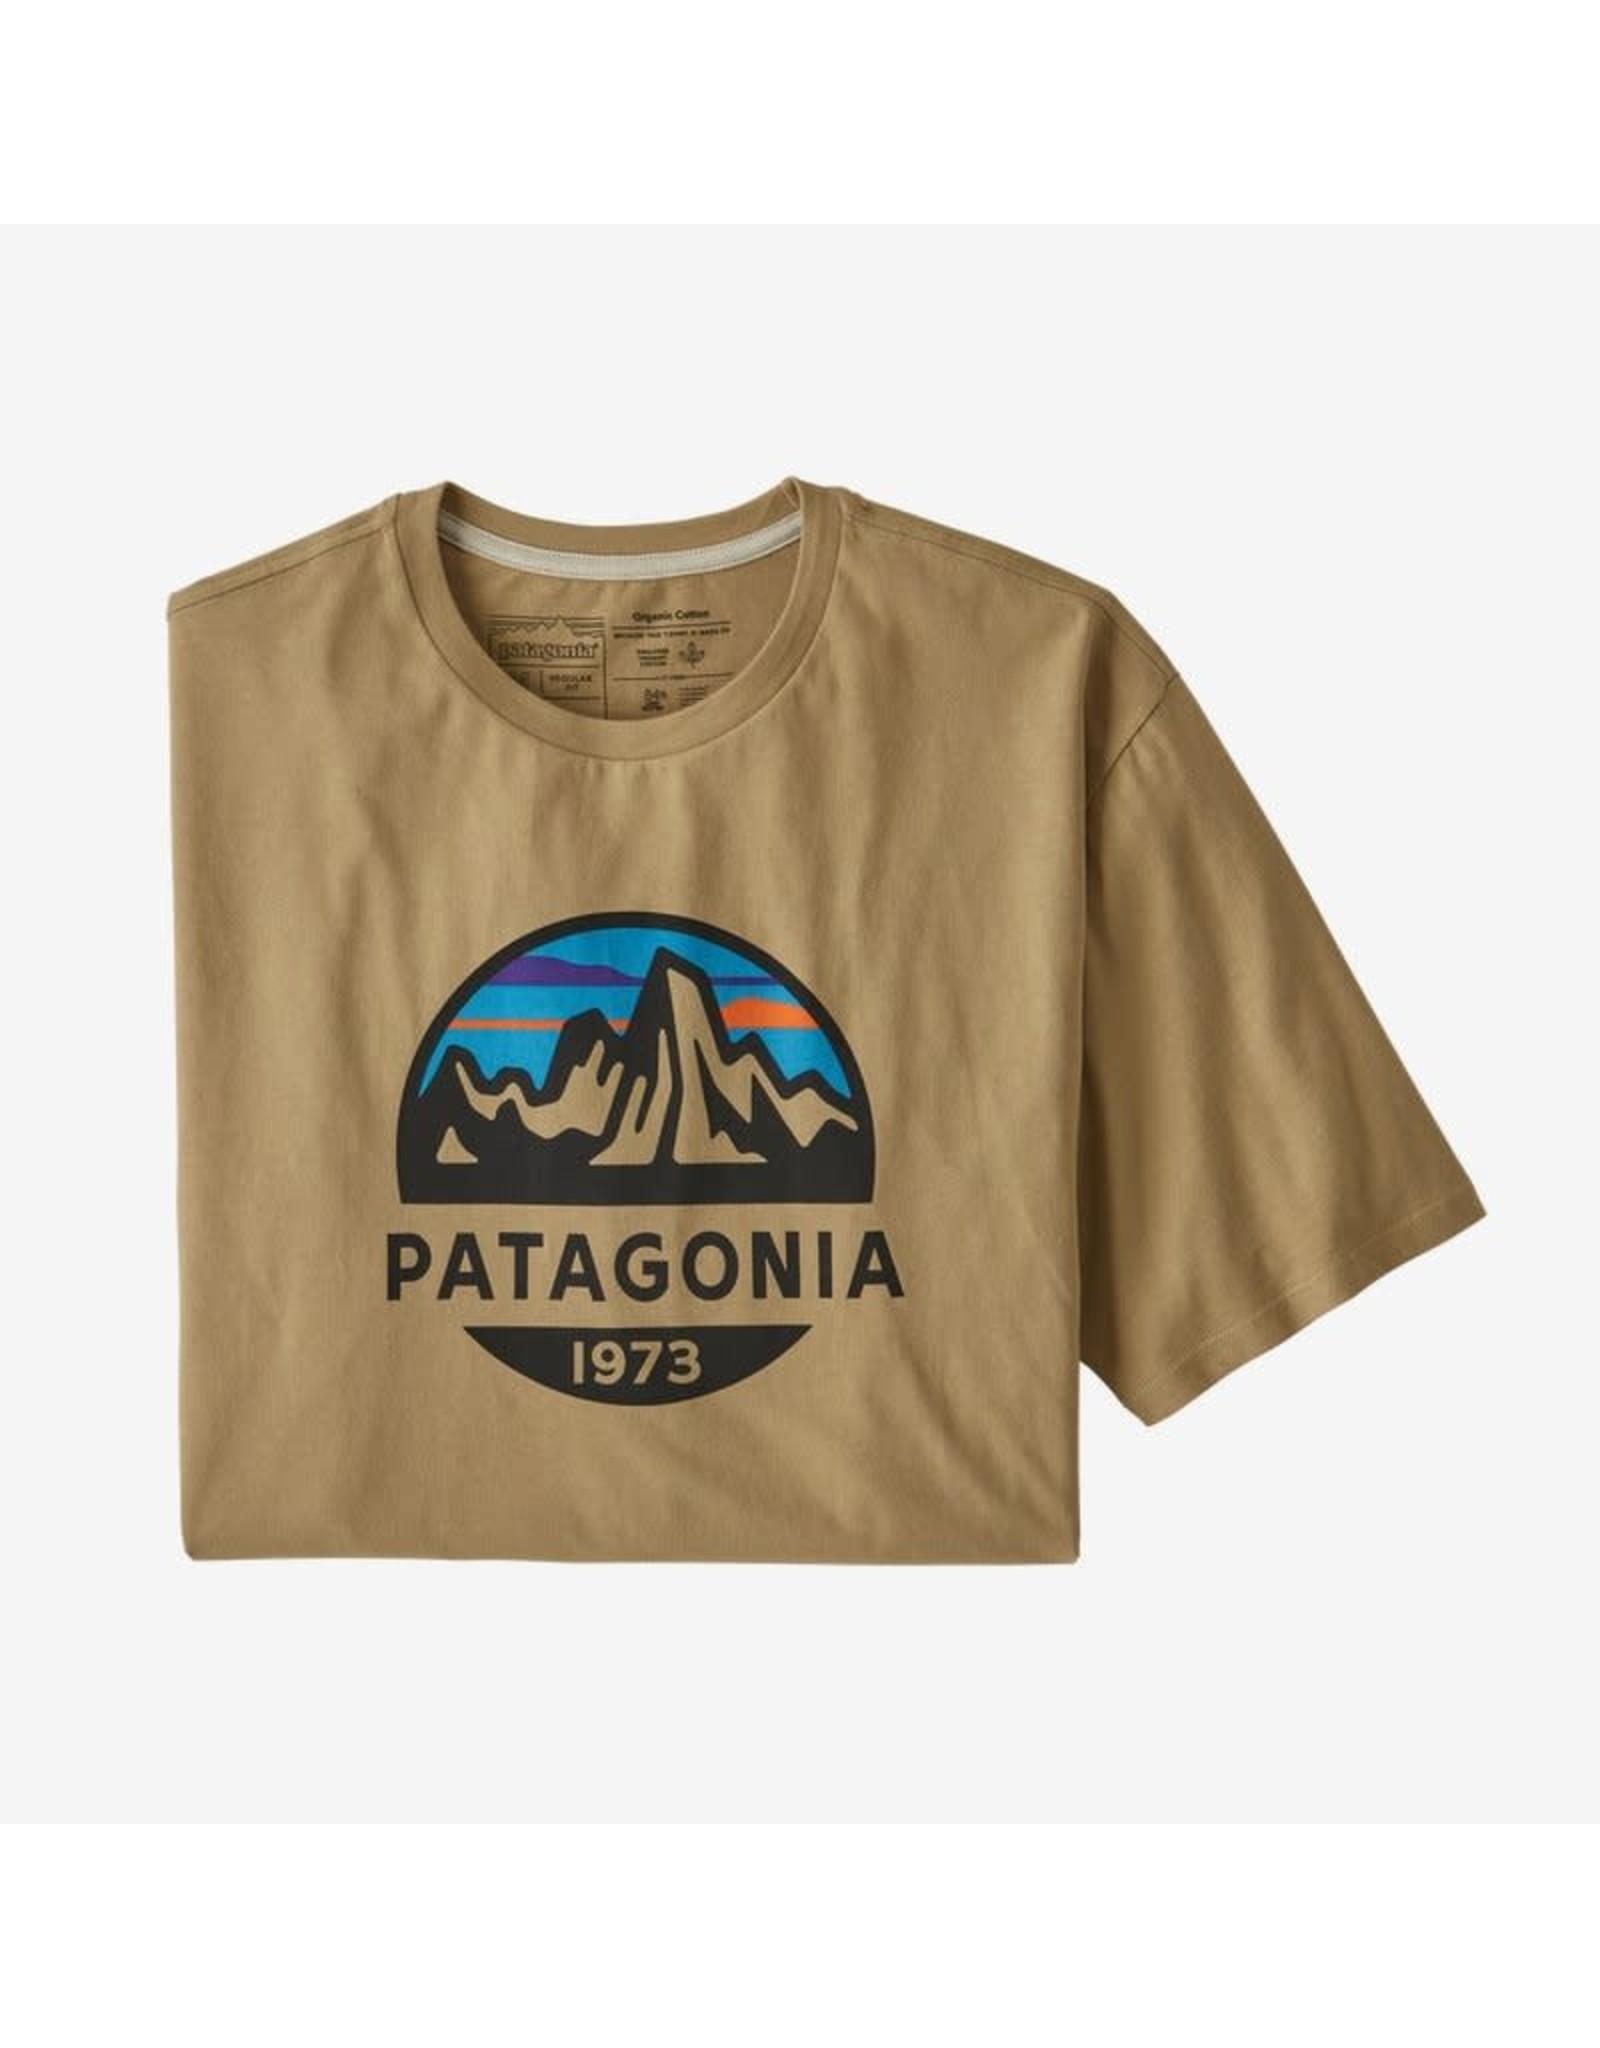 Patagonia Patagonia - T-shirt homme fitz roy scope organic classic tan